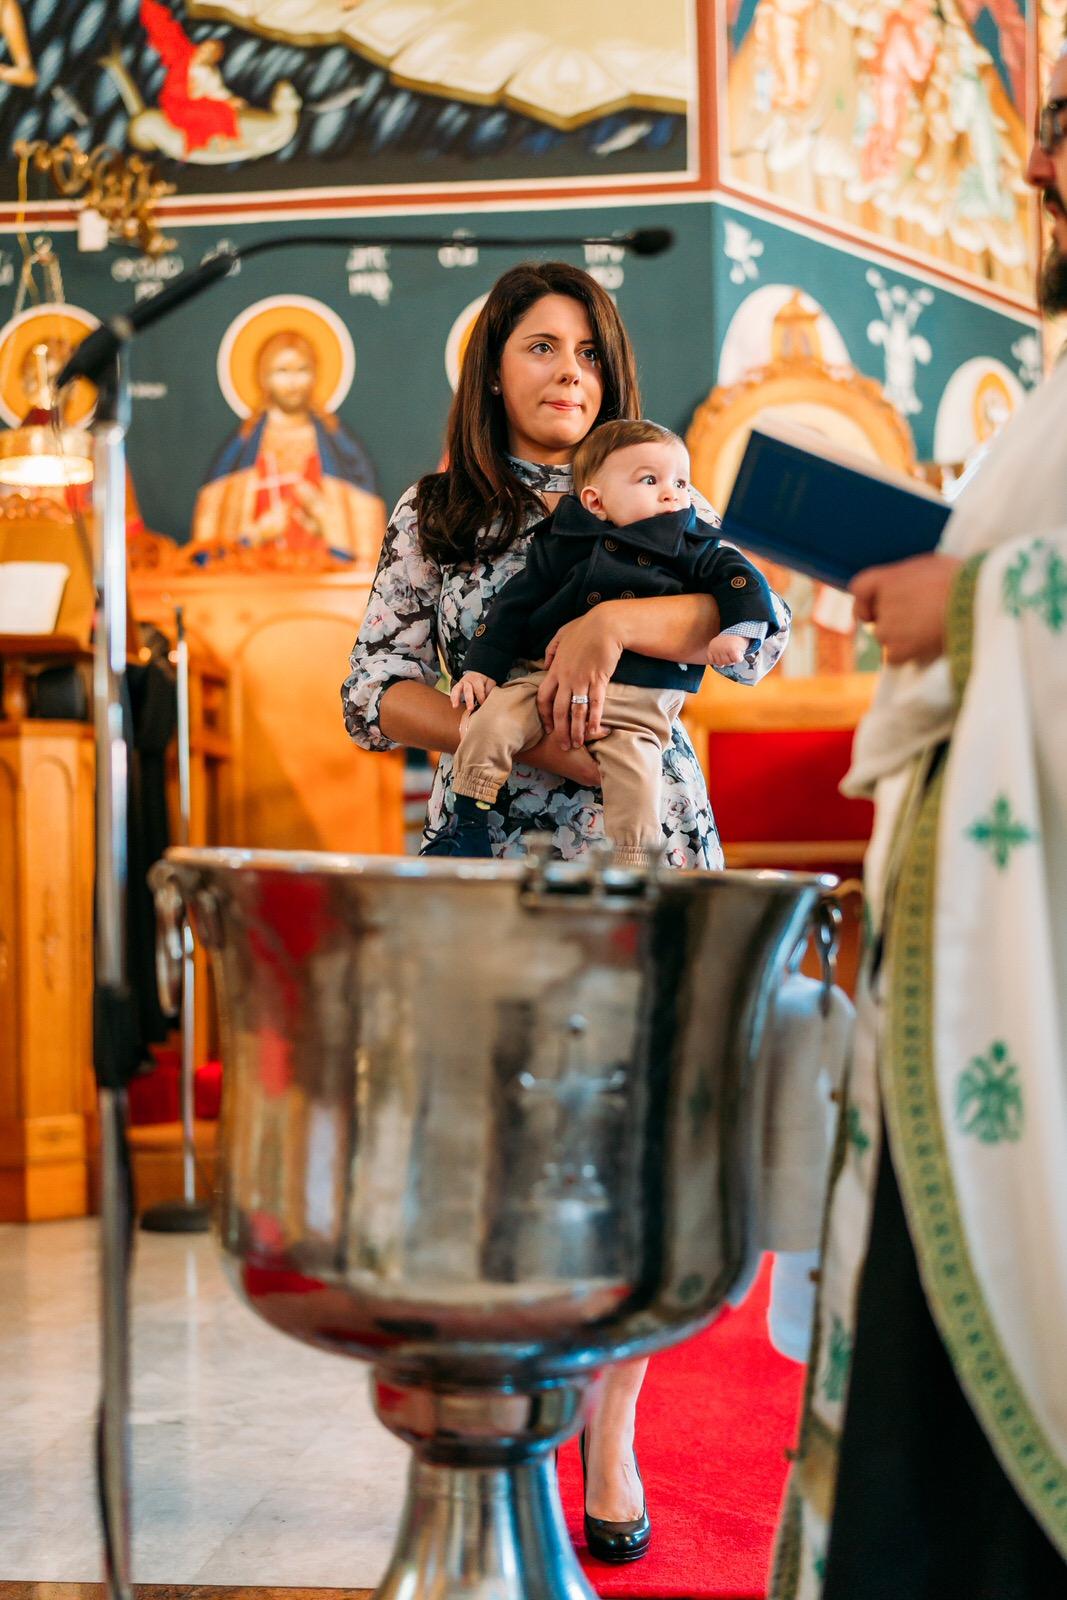 yianni-baptism-st-catherine-orthodox-mascot-laqua-72